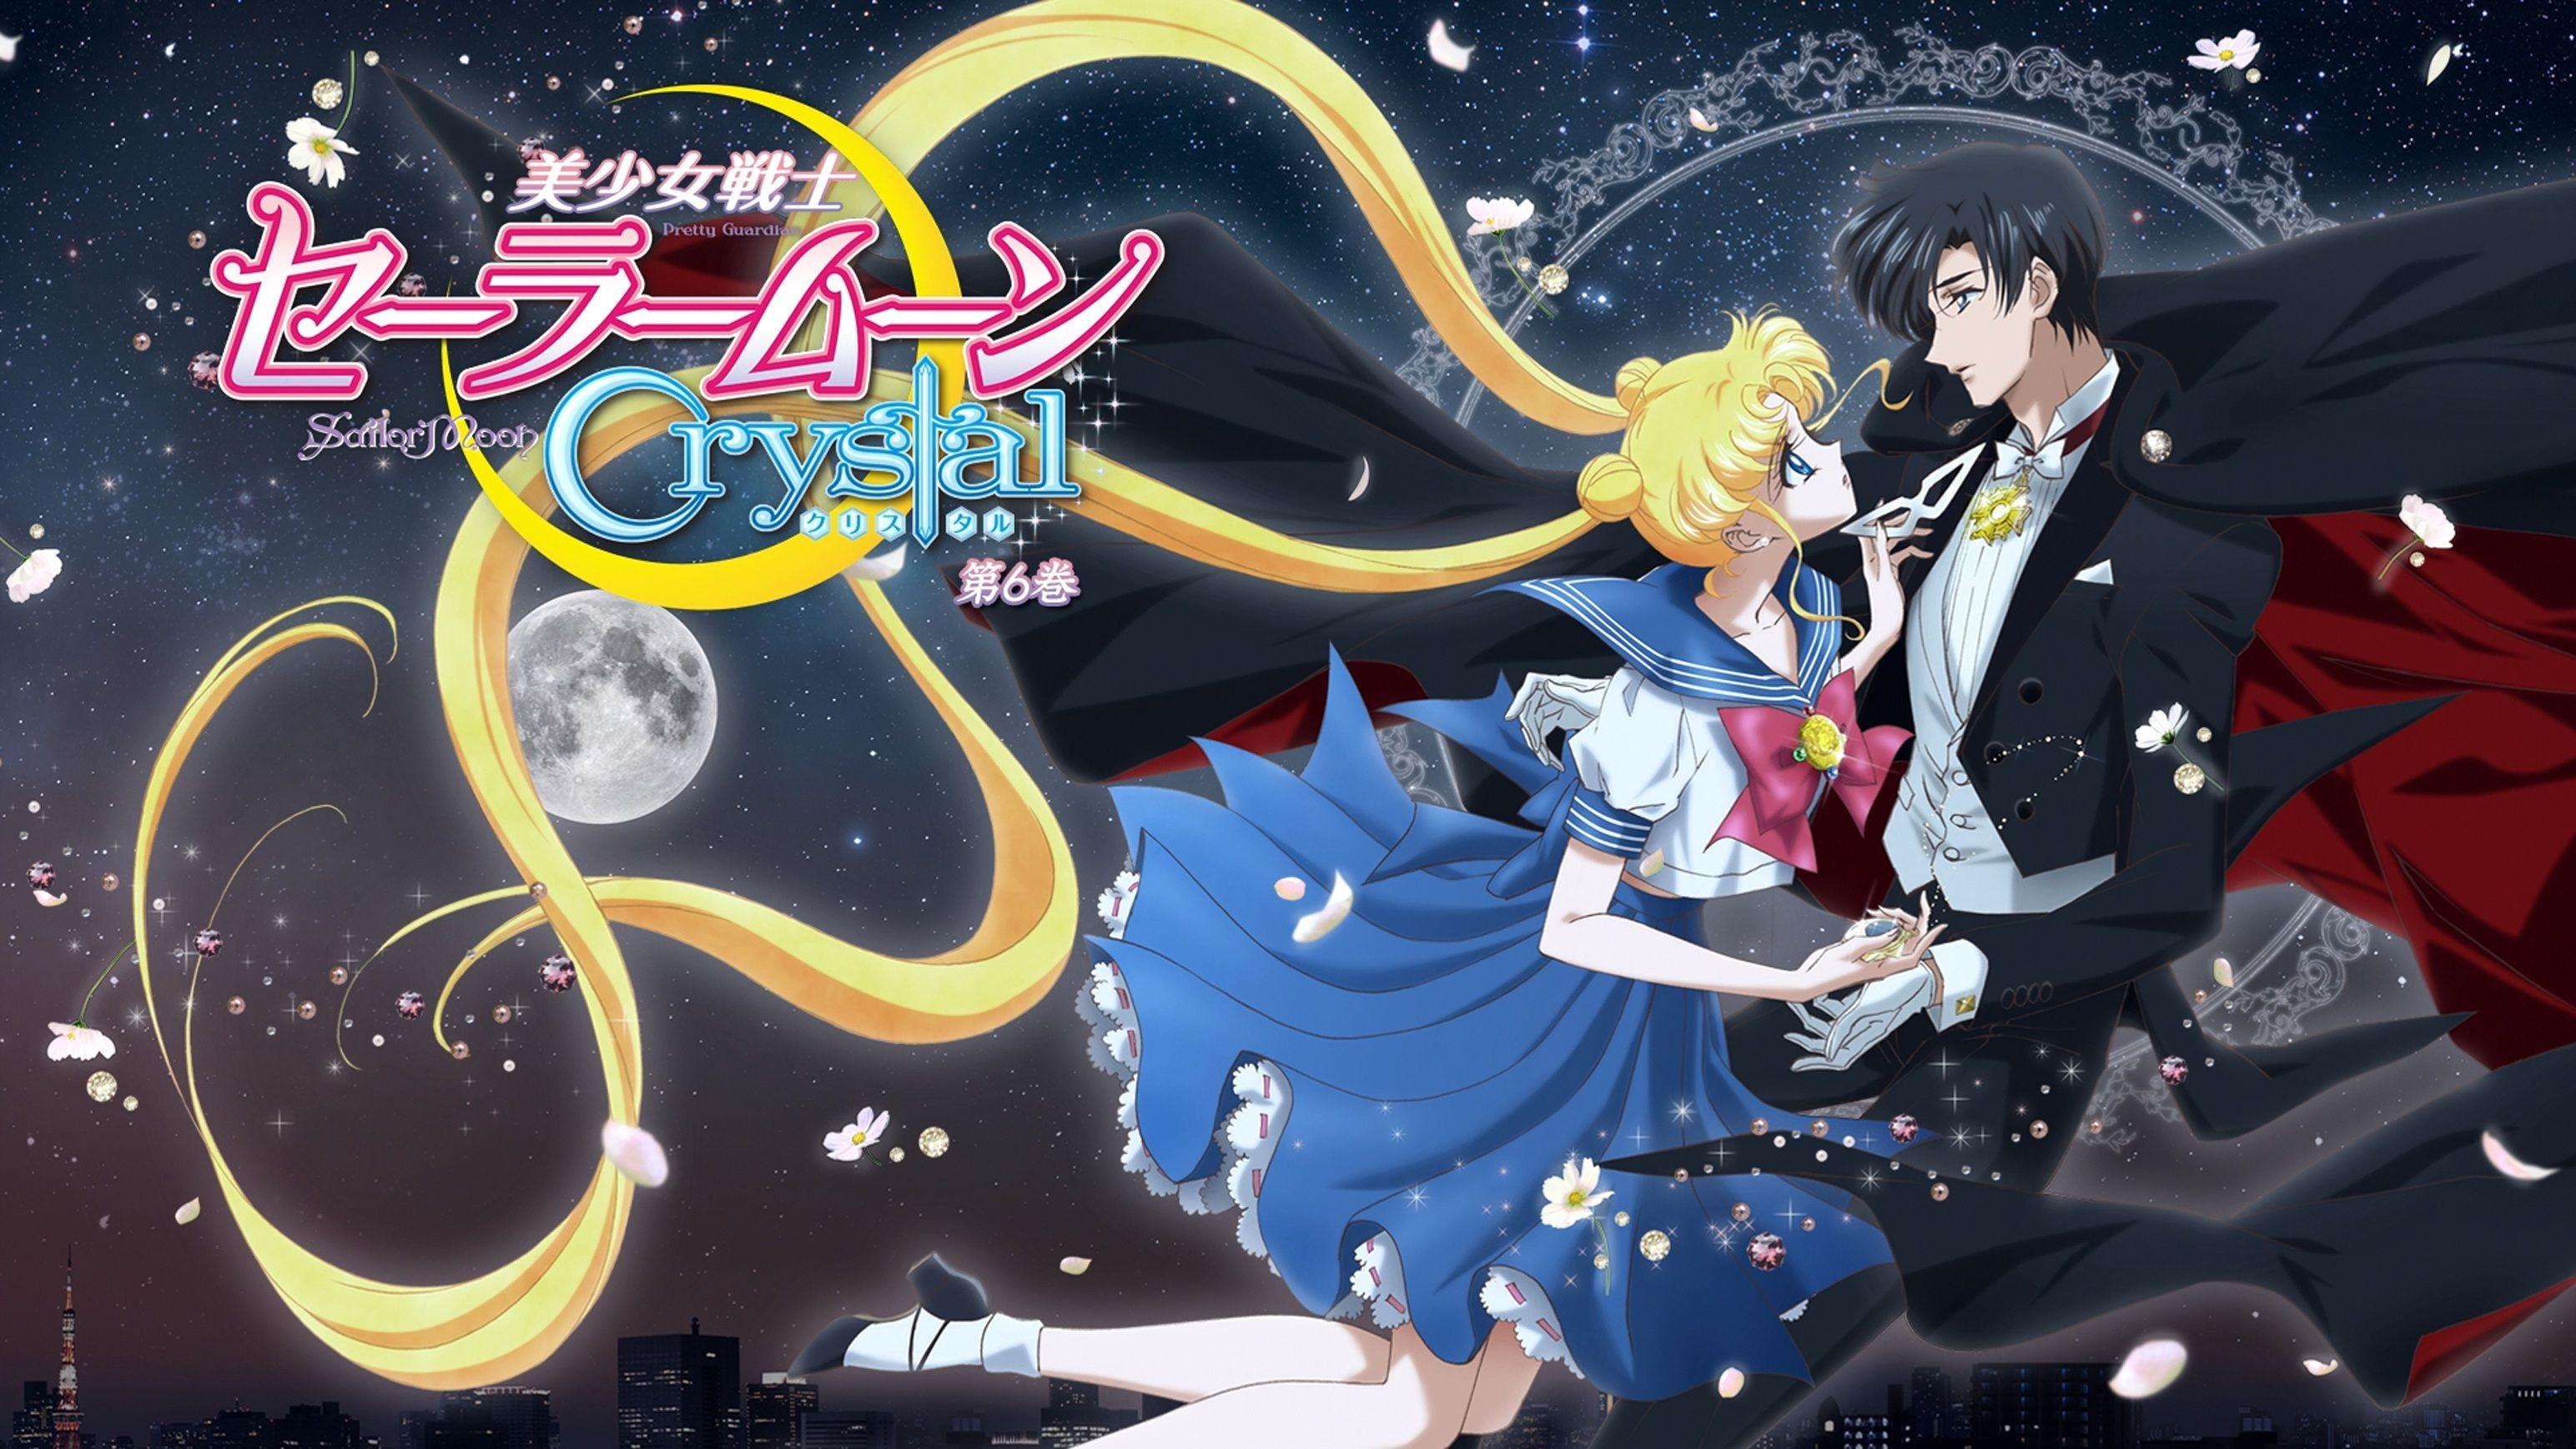 Wallpaper Hd Sailor Moon Crystal Dvd 6 Sailor Moon Crystal